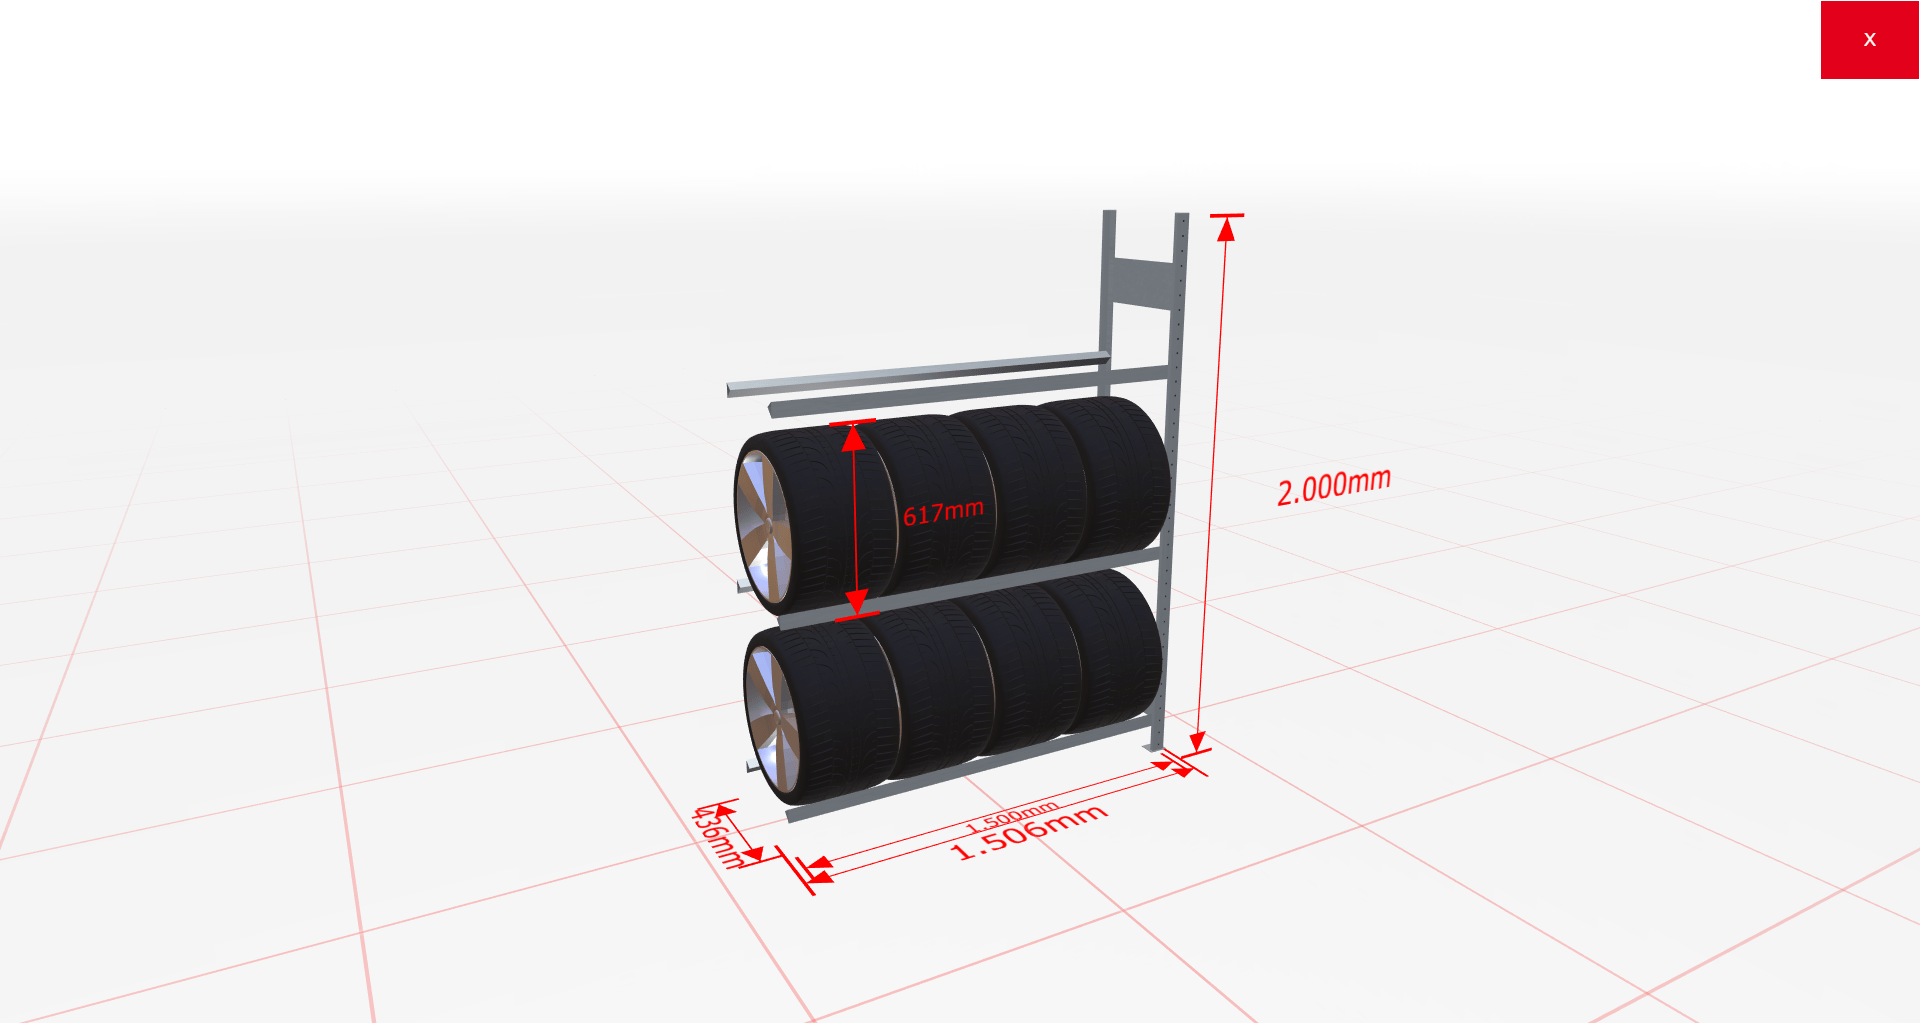 Reifenregal Anbauregal SCHULTE Lagertechnik 2000x1500x400 mm – 3 Ebenen à 1500 mm, verzinkt